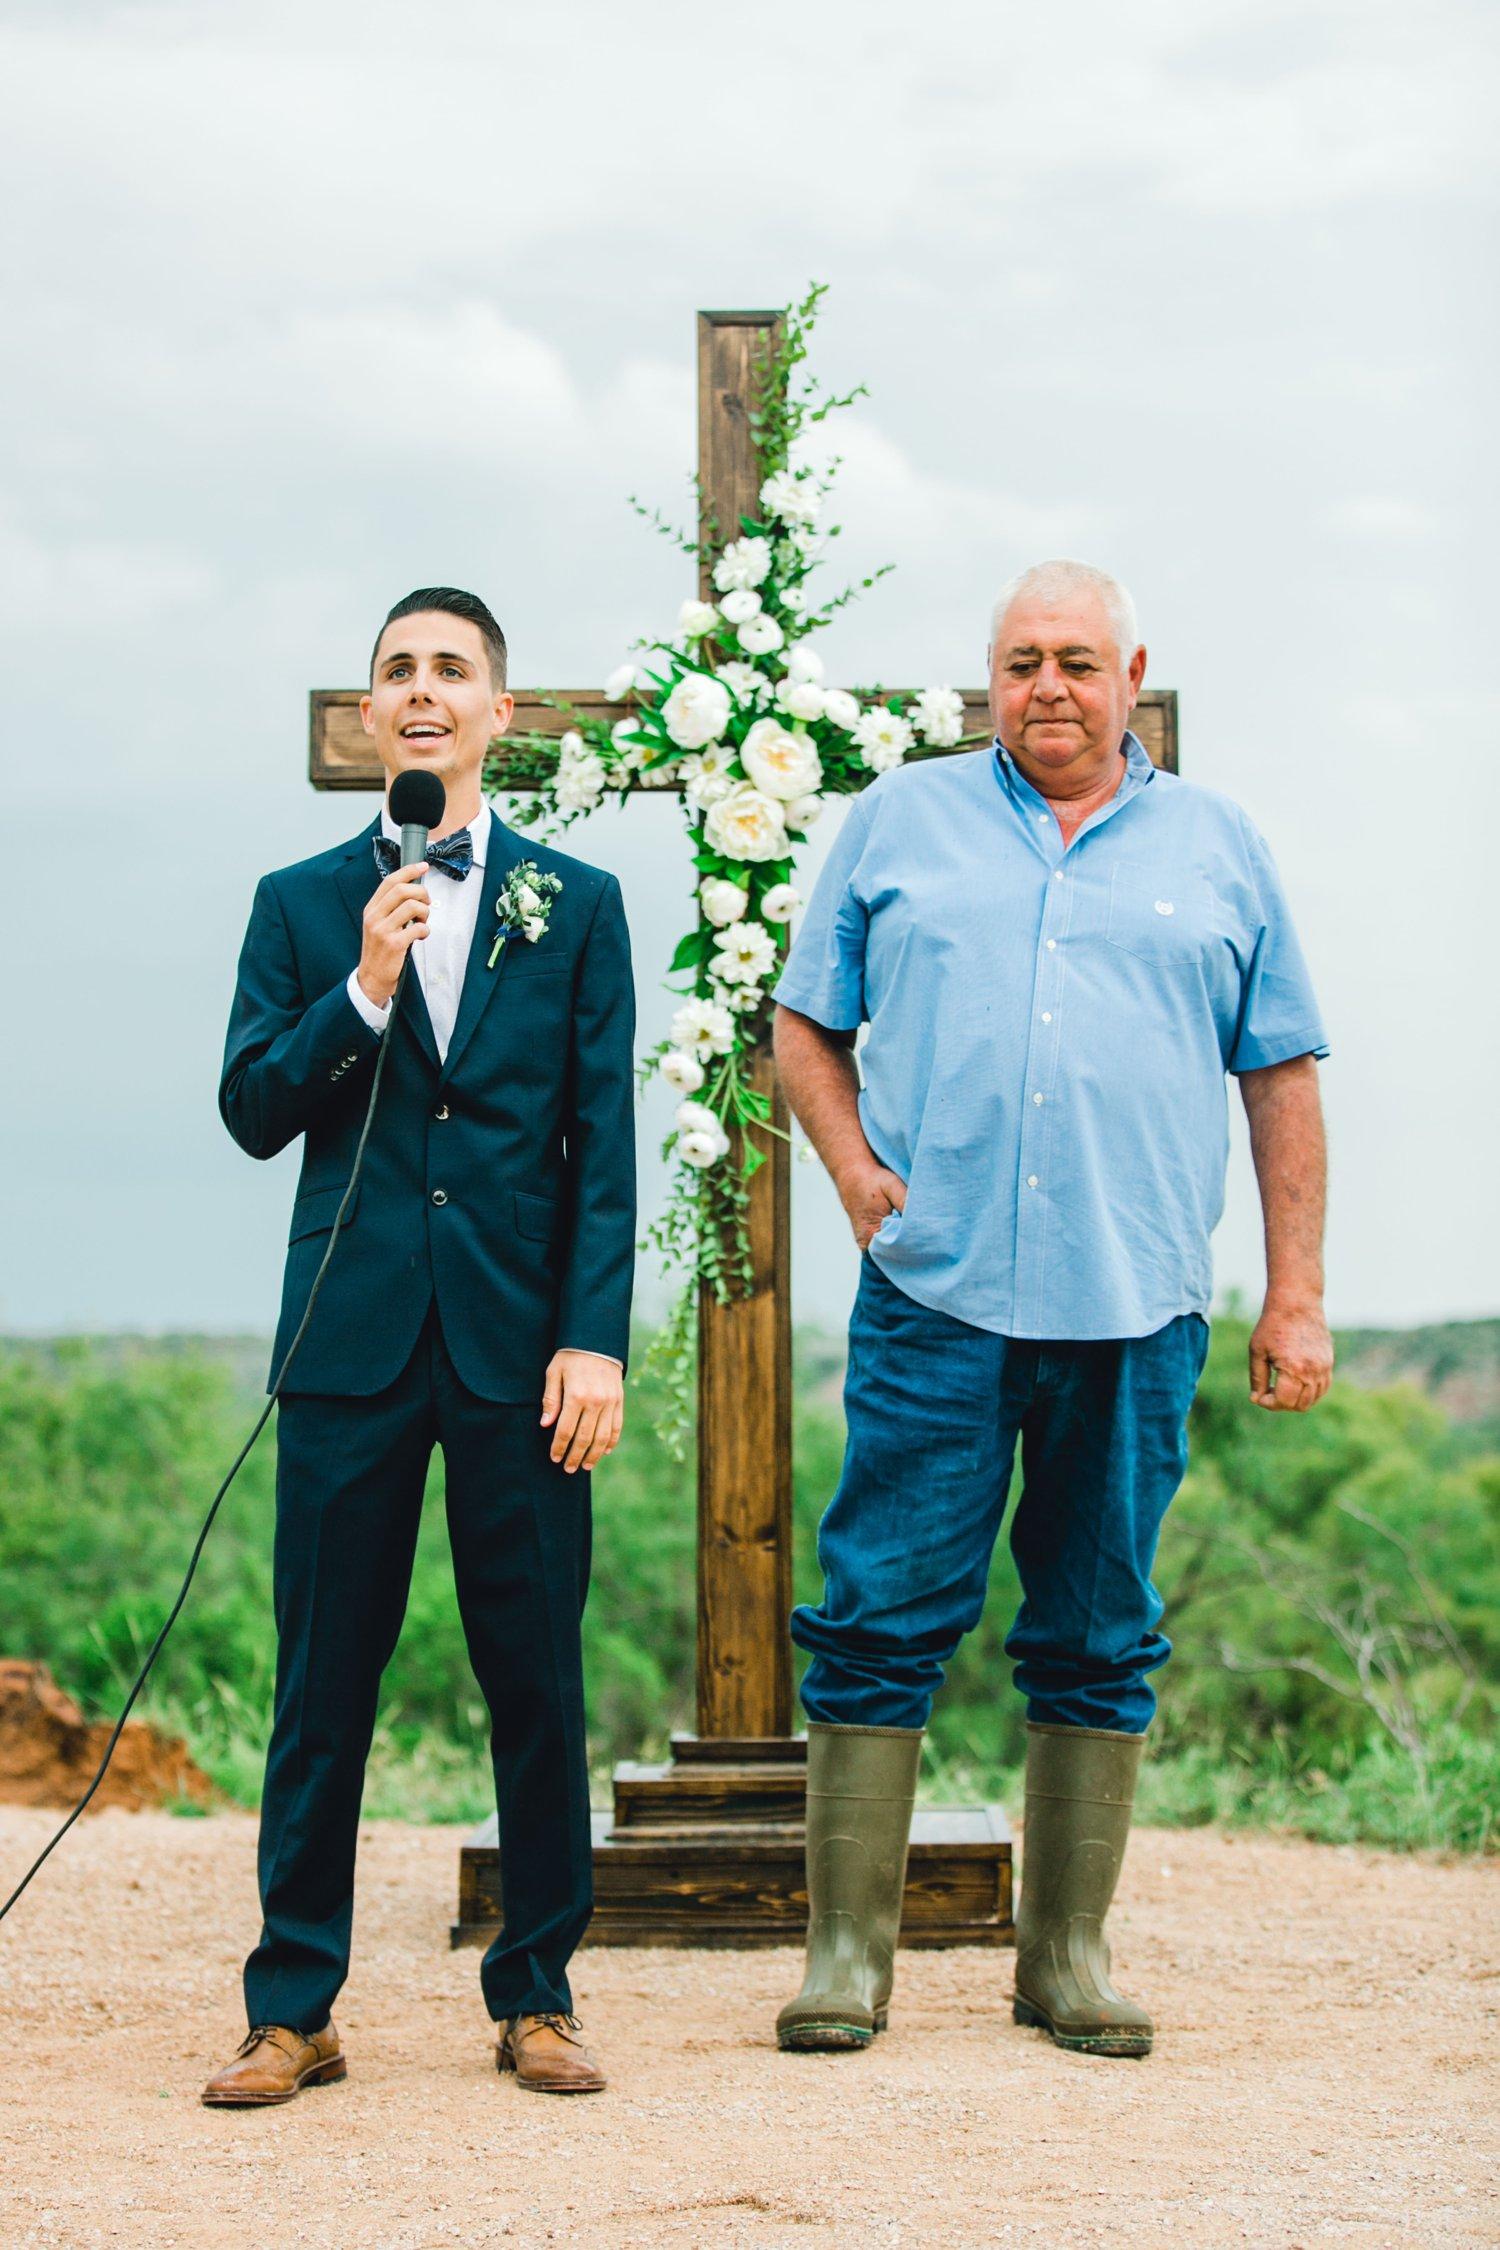 Ashley_John_English_Elegant_Texas_Wedding_Outdoors_Ranch_Caprock_Winery_ALLEEJ_0093.jpg